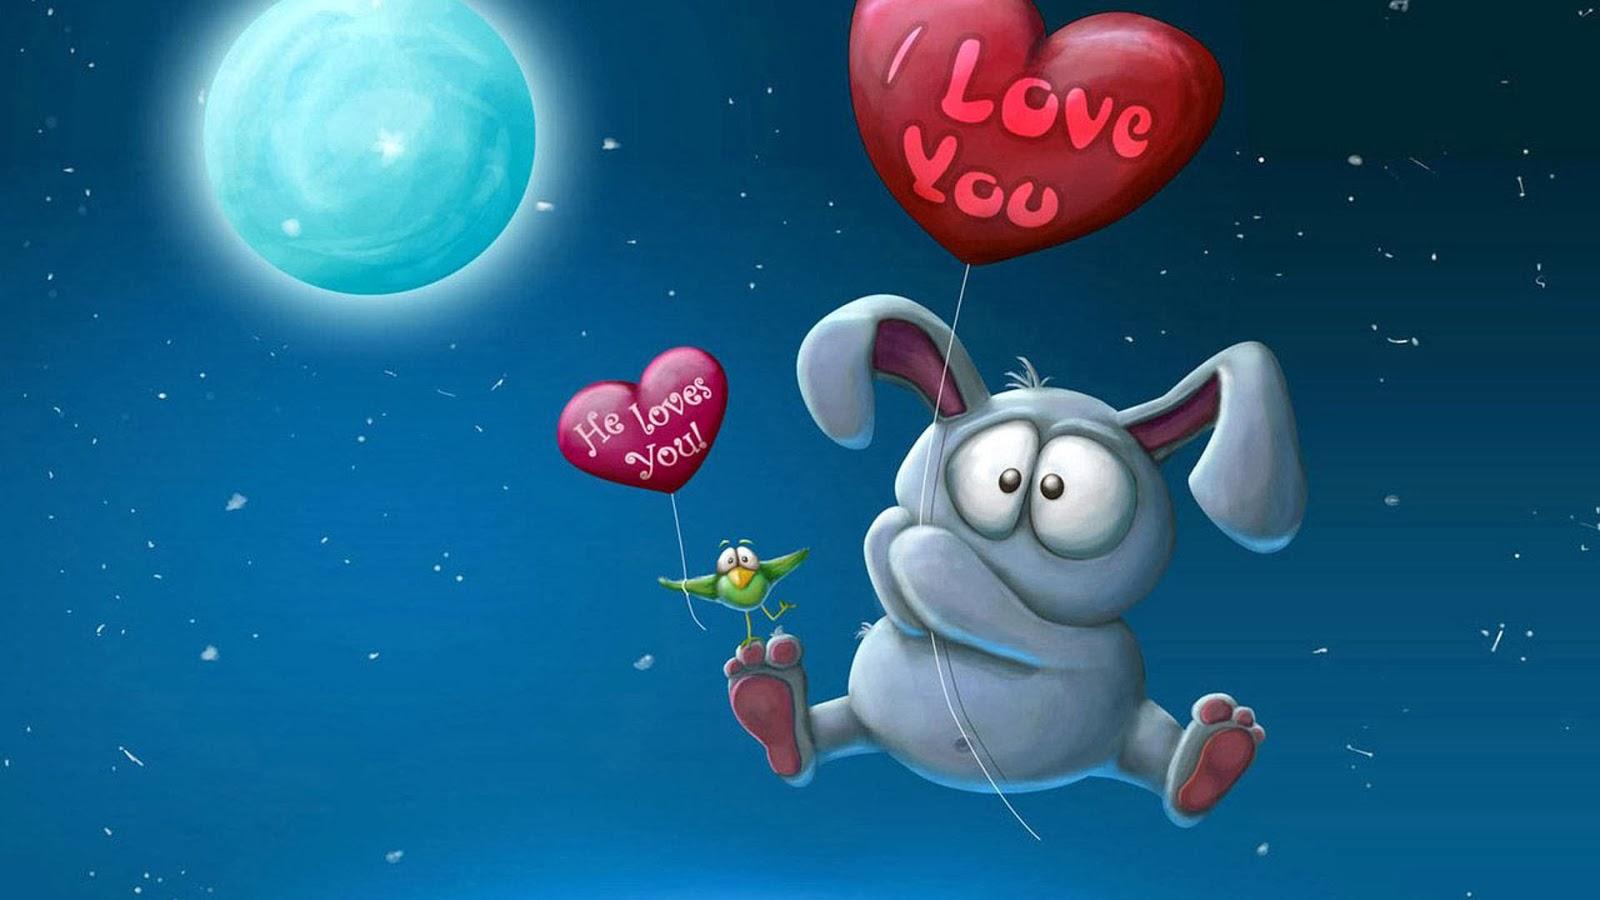 I Love You Funny Cartoon Wallpaper